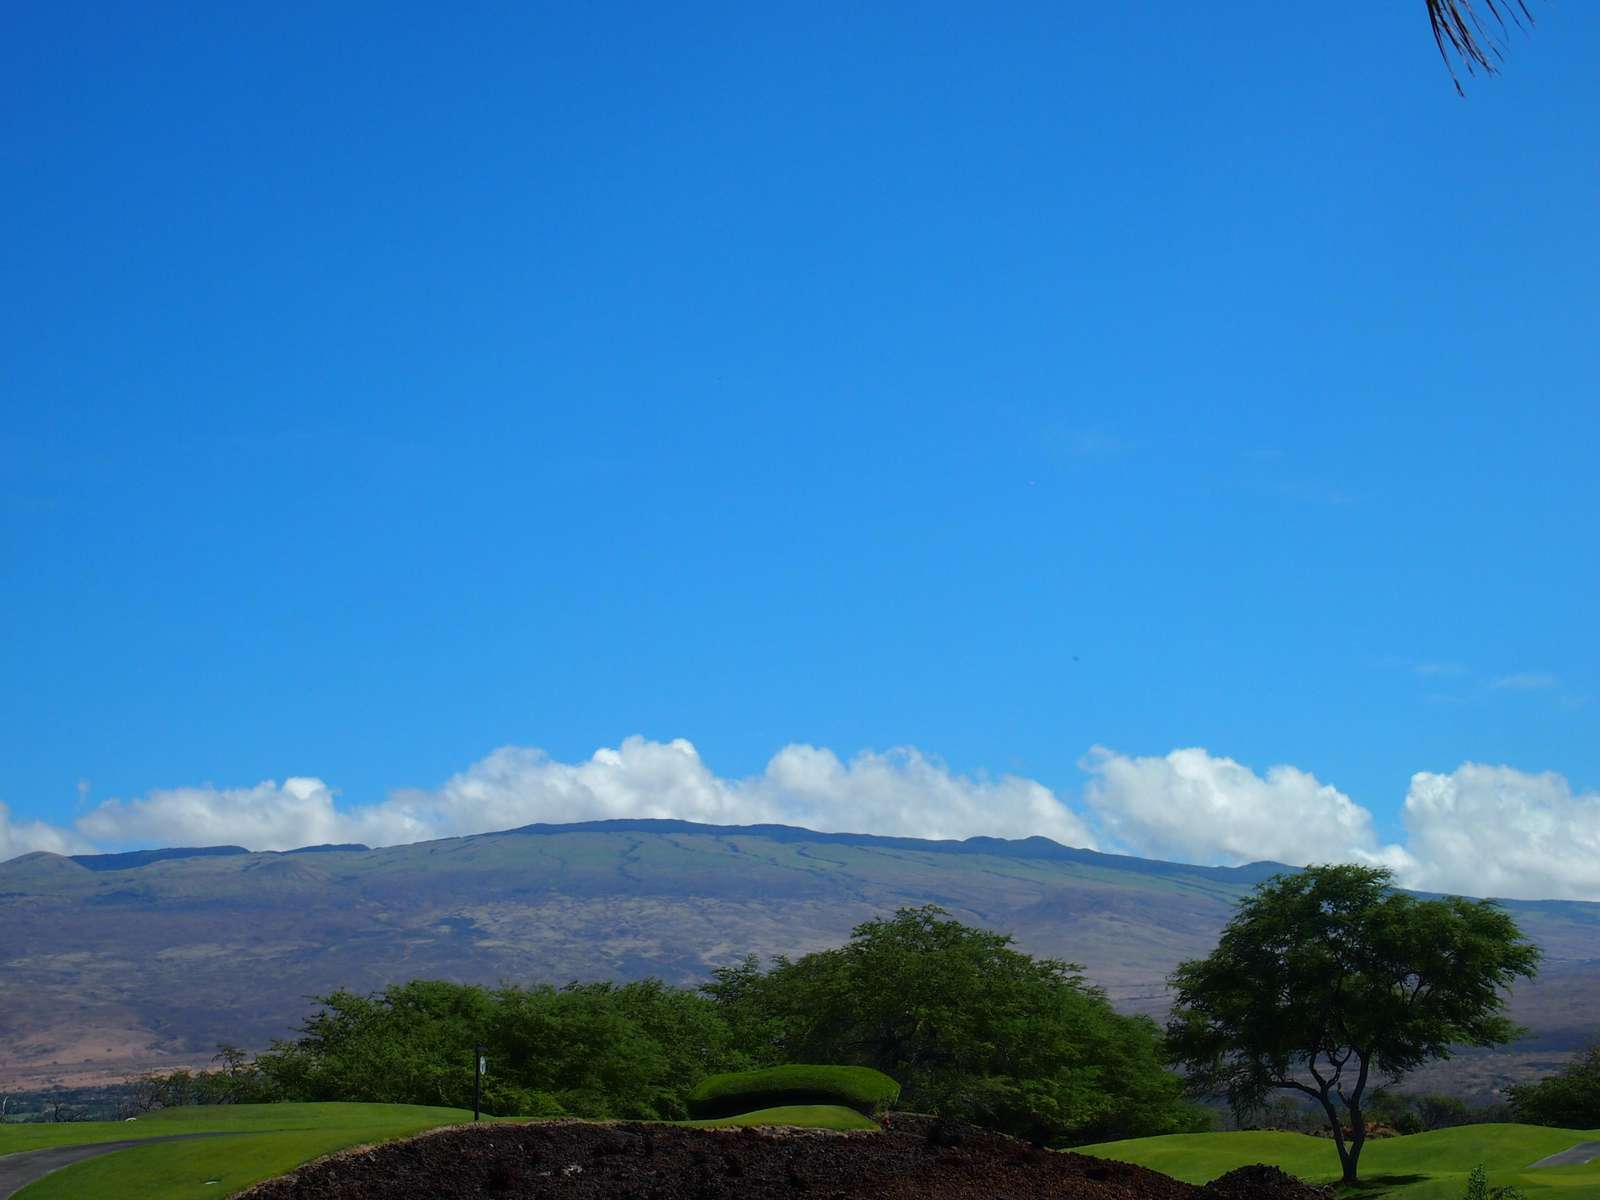 Beautiful view of the Kohala Mountain